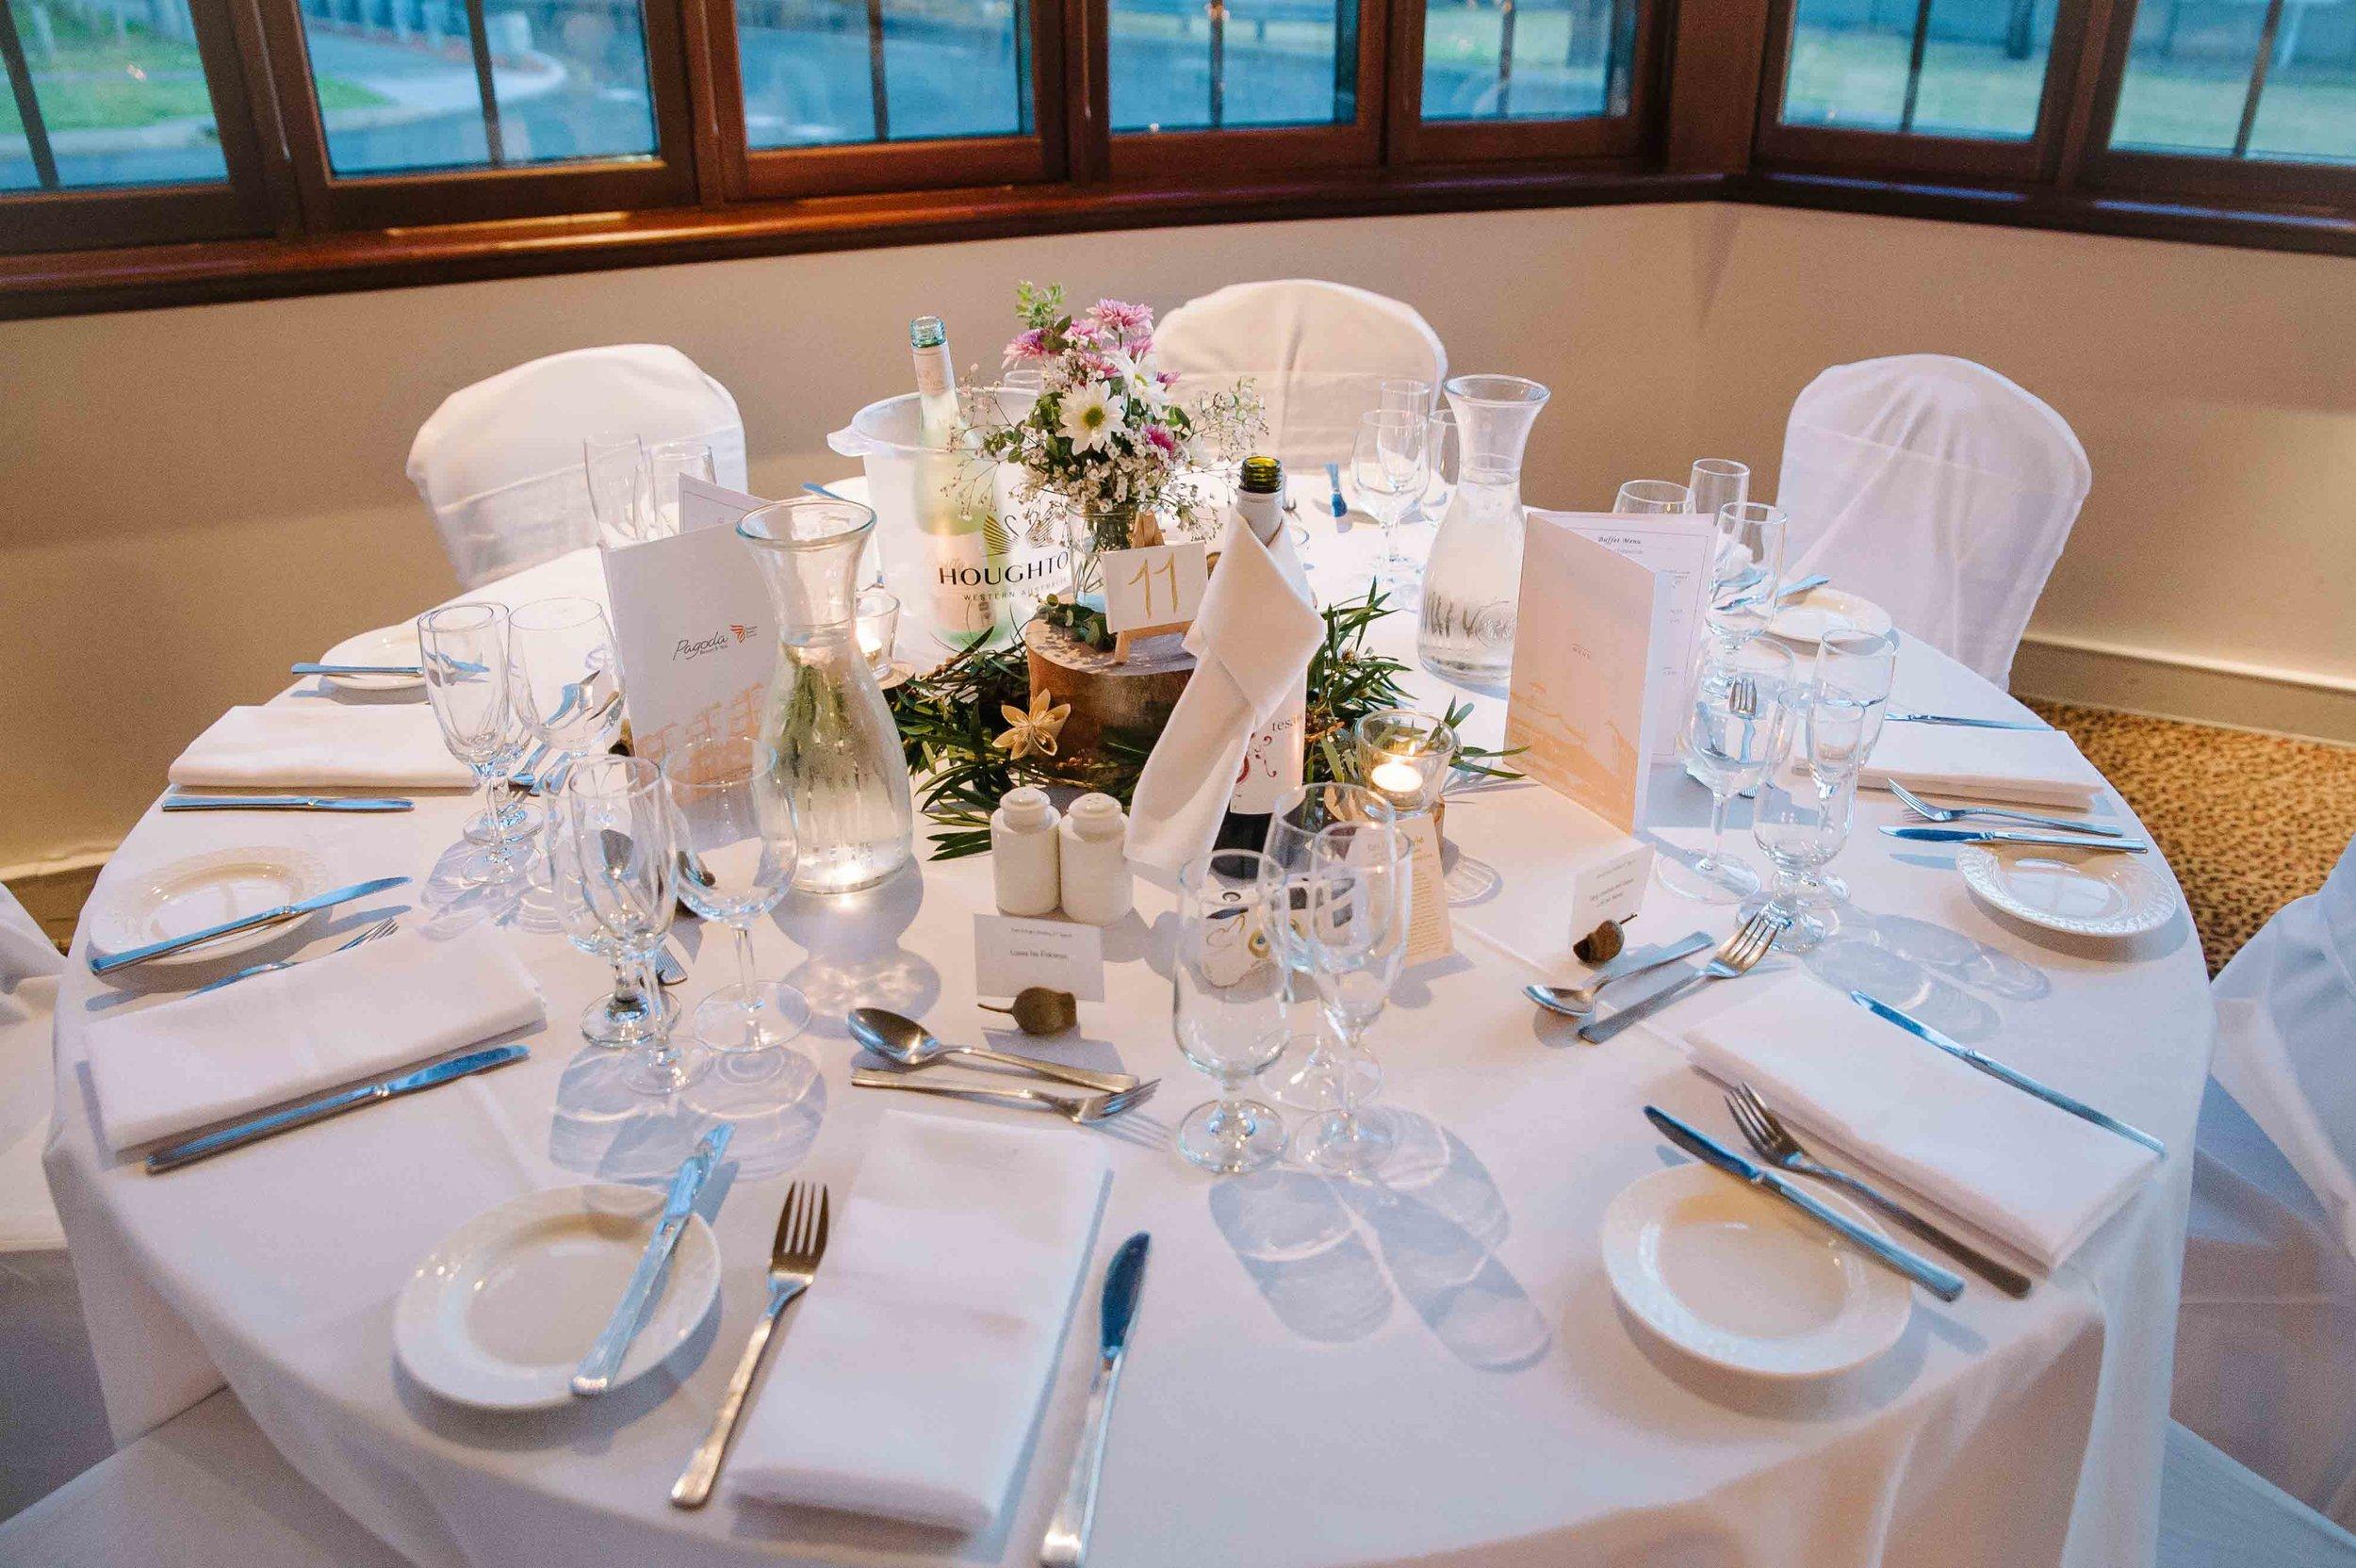 70-south perth wedding venue.jpg